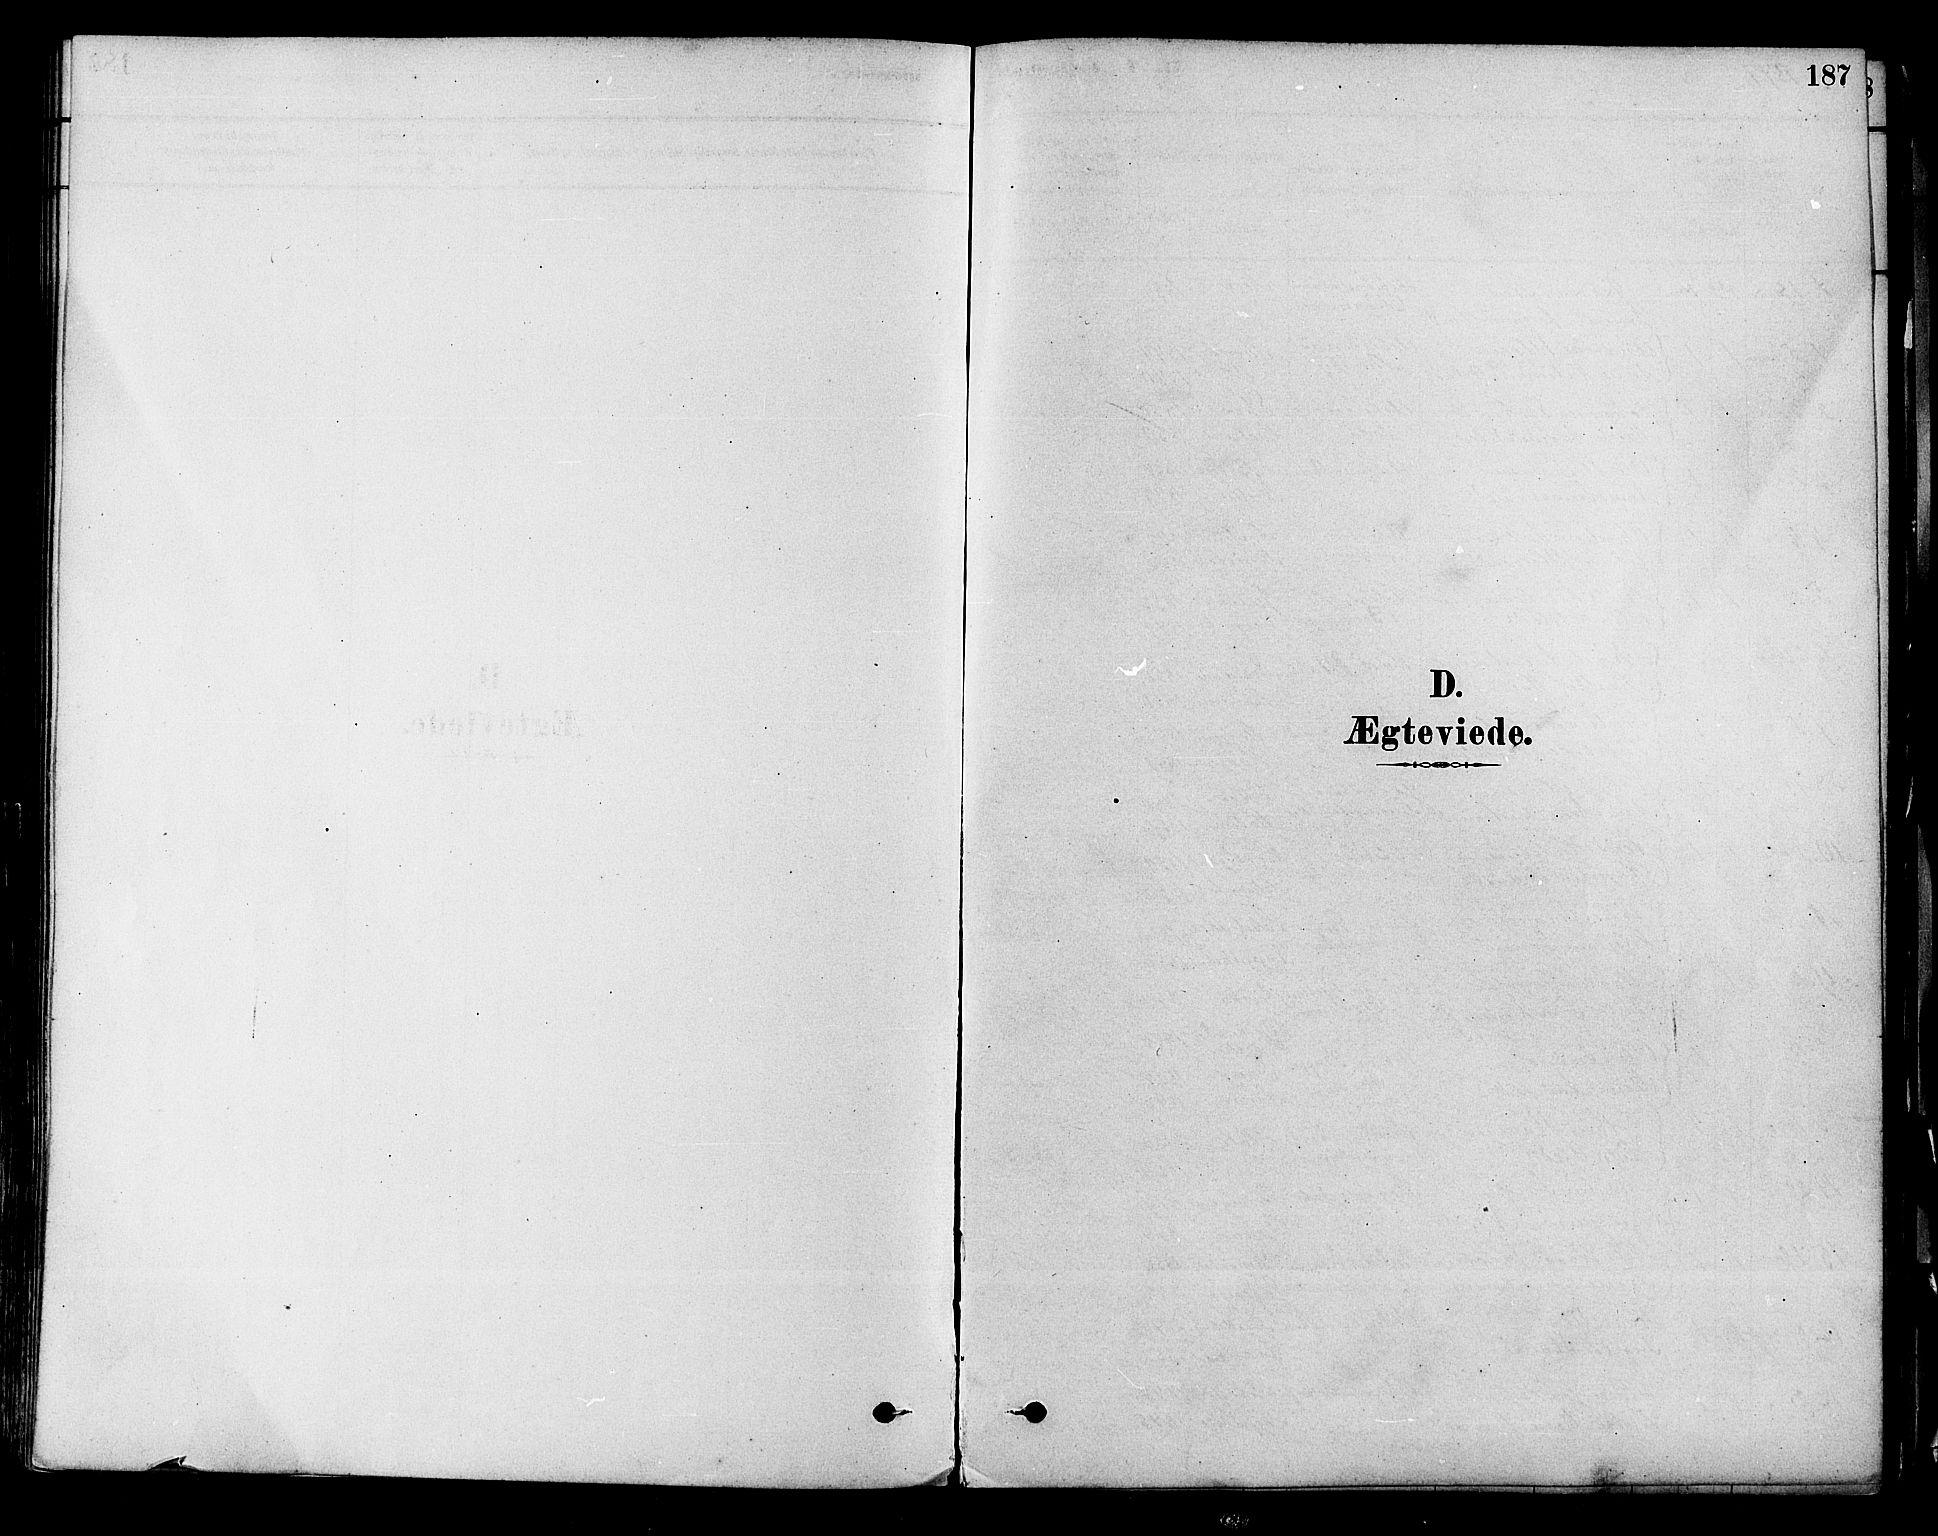 SAKO, Modum kirkebøker, F/Fa/L0011: Ministerialbok nr. 11, 1877-1889, s. 187